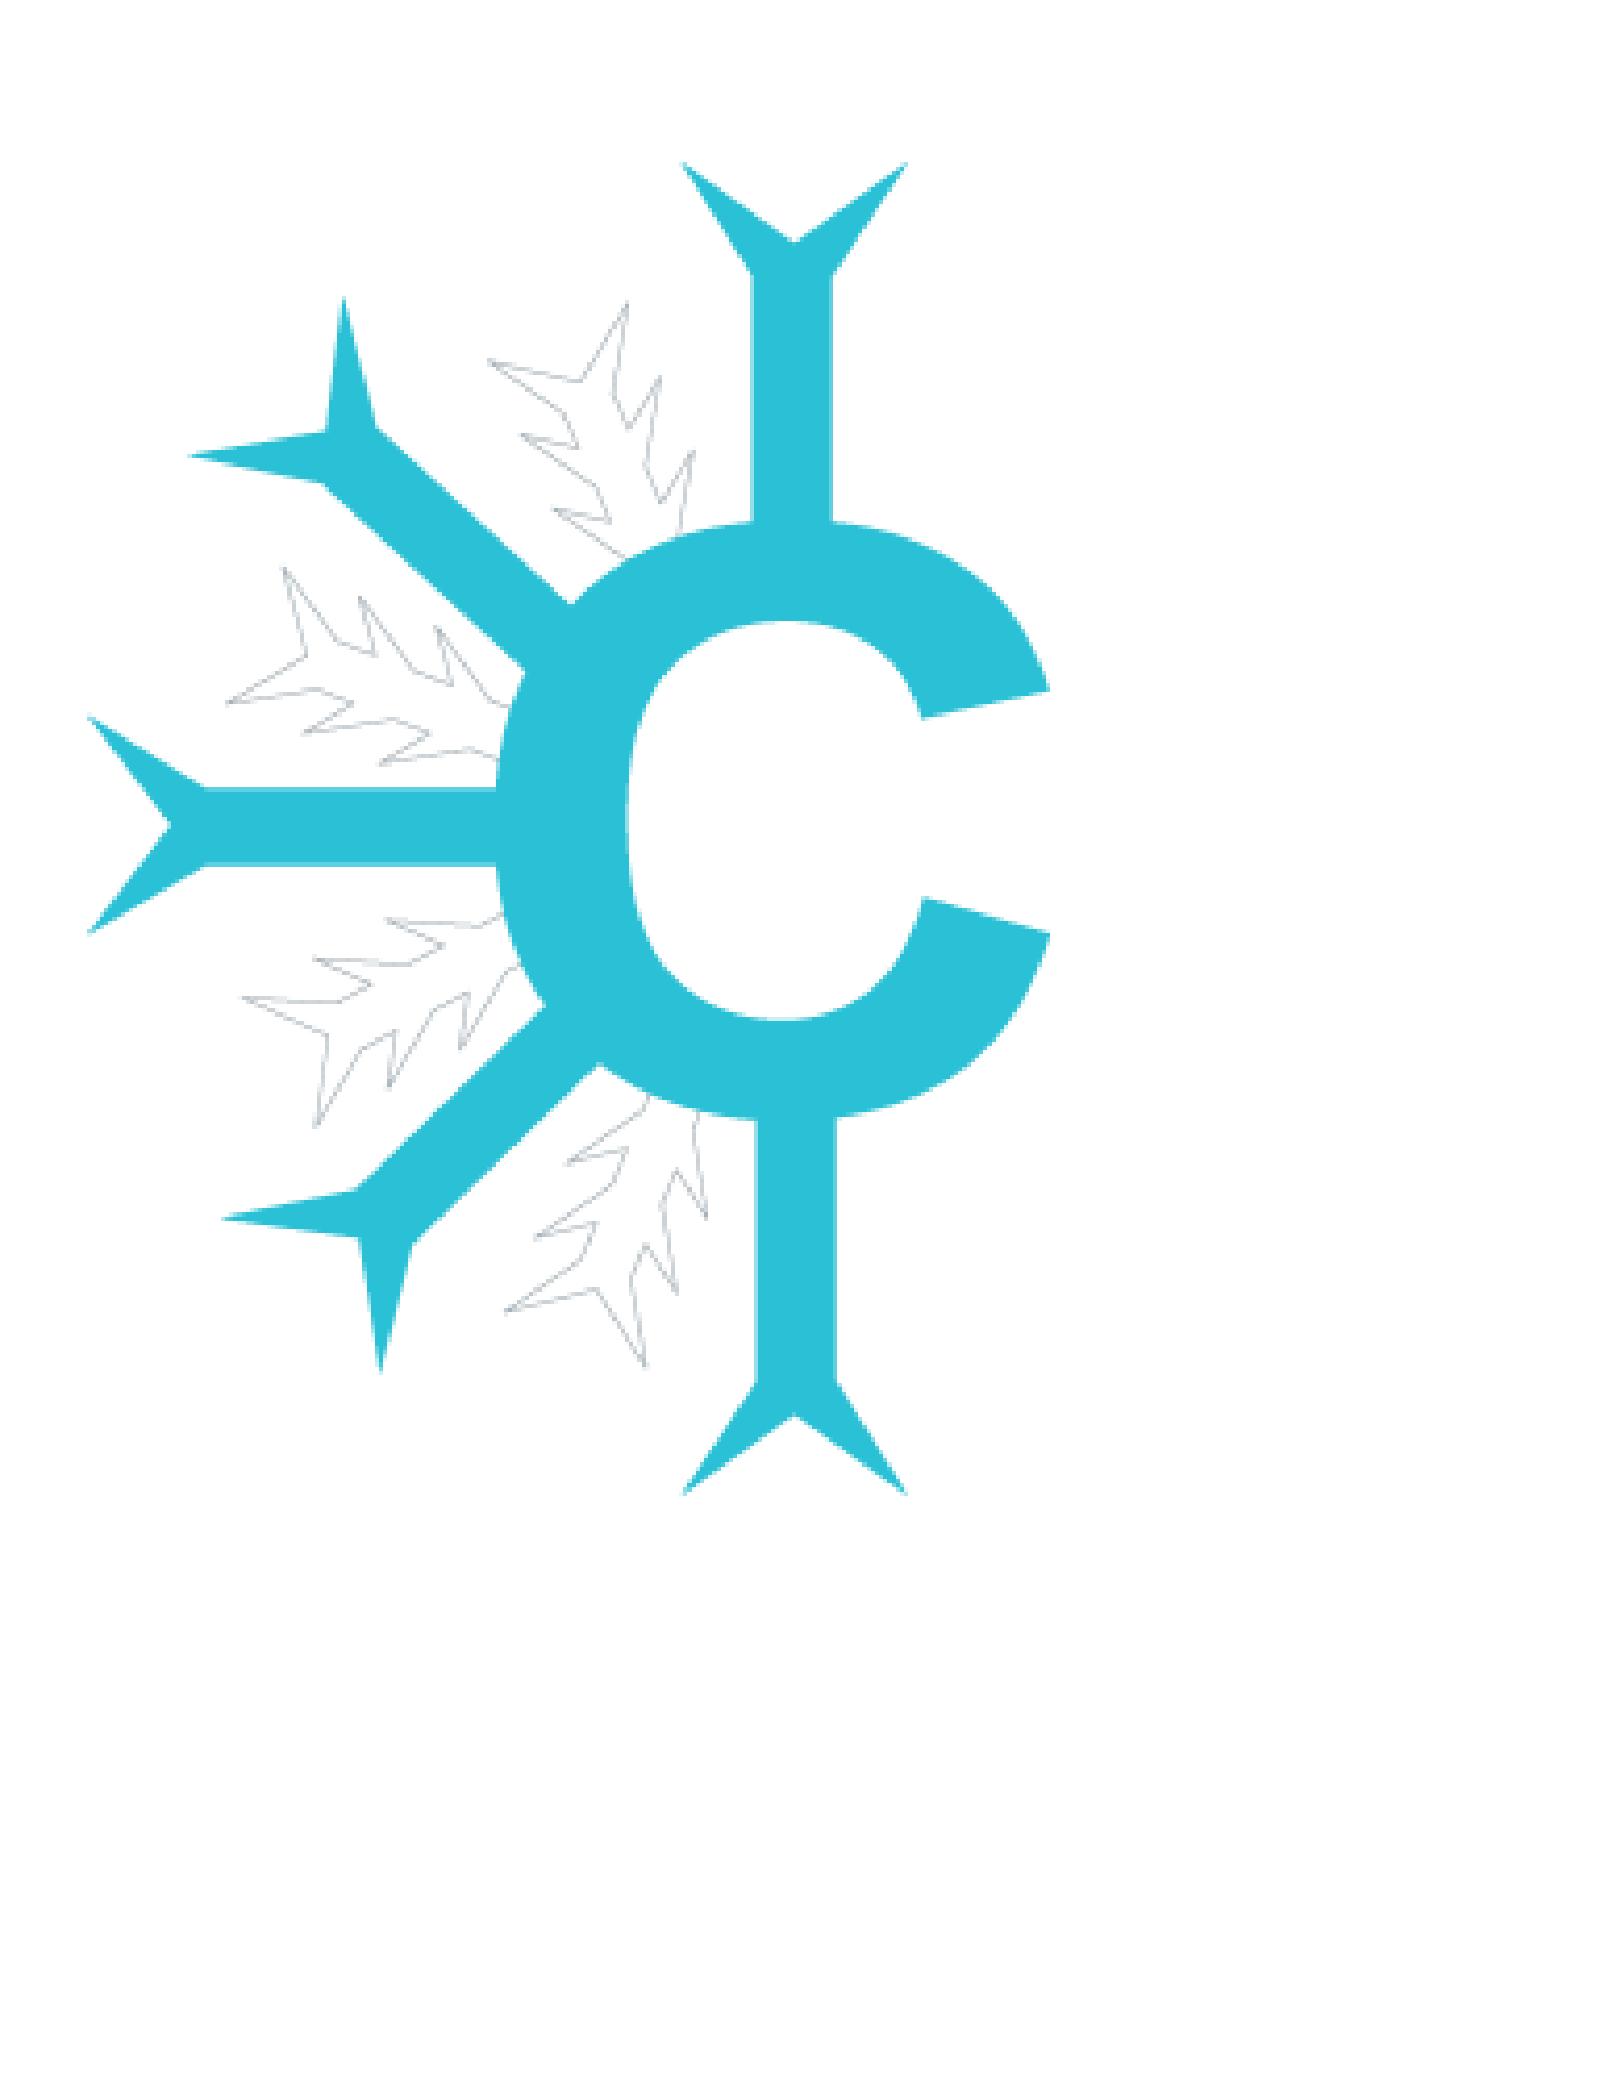 Cryozonecoldceealpha